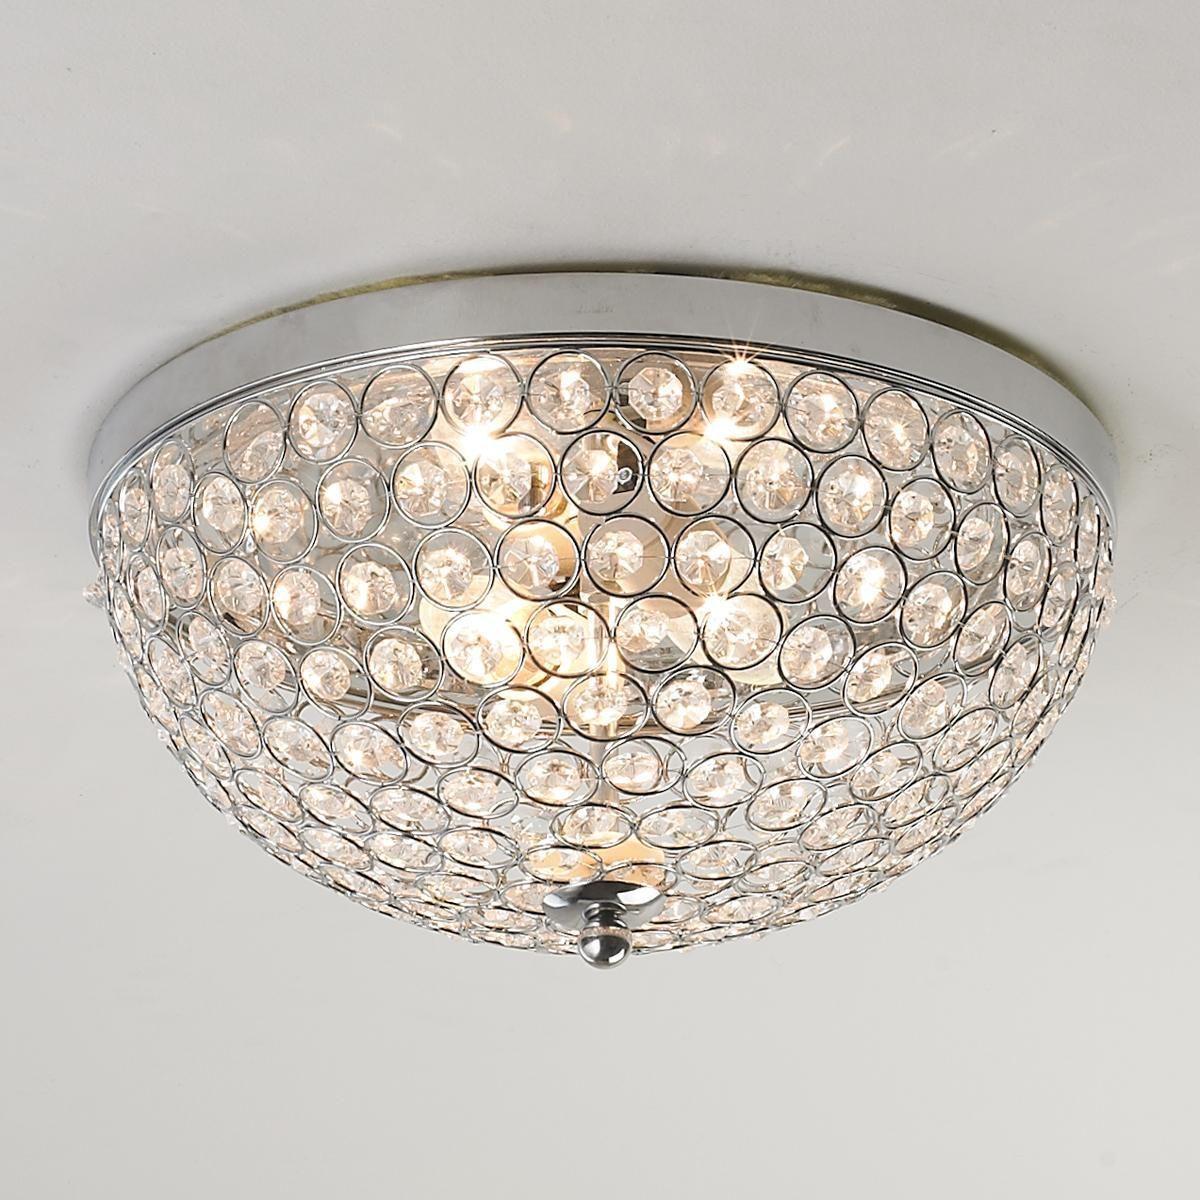 Crystal Jewel Ceiling Light For The Home Bathroom